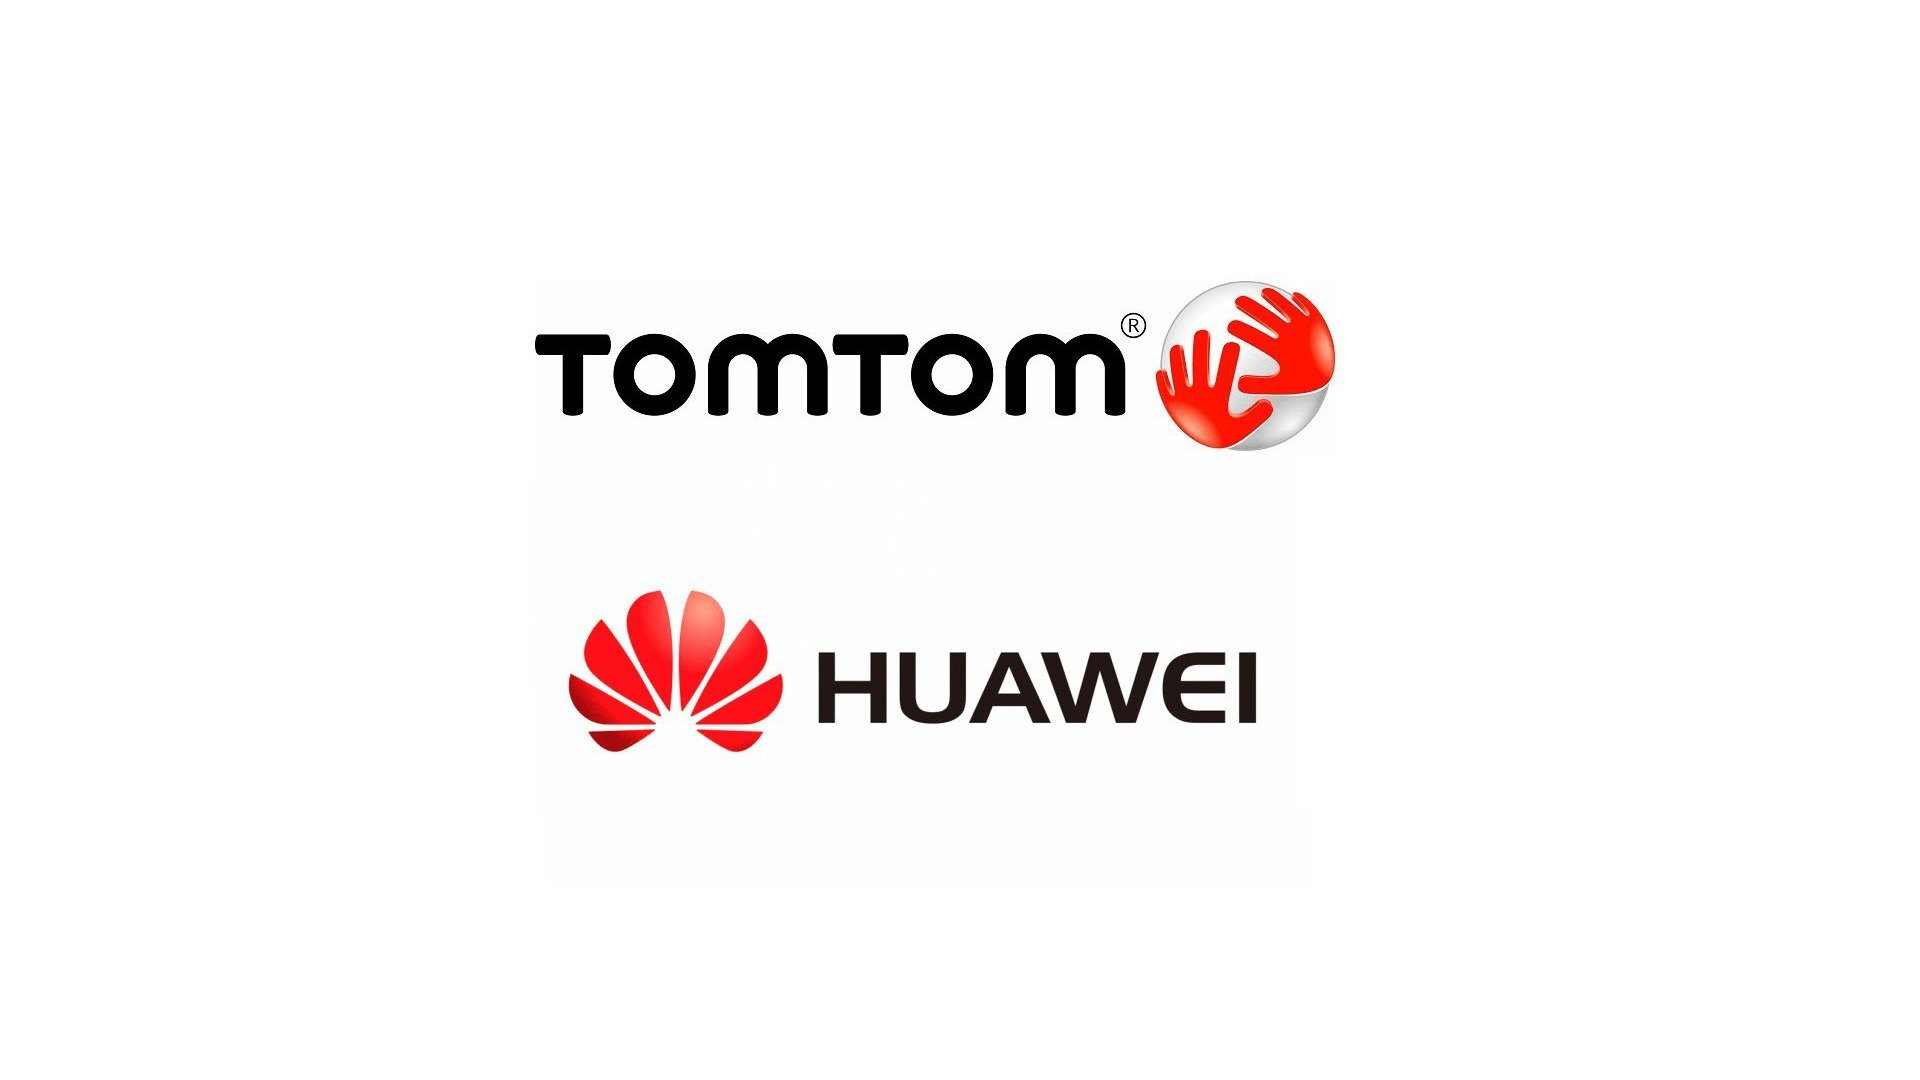 Huawei - TomTom